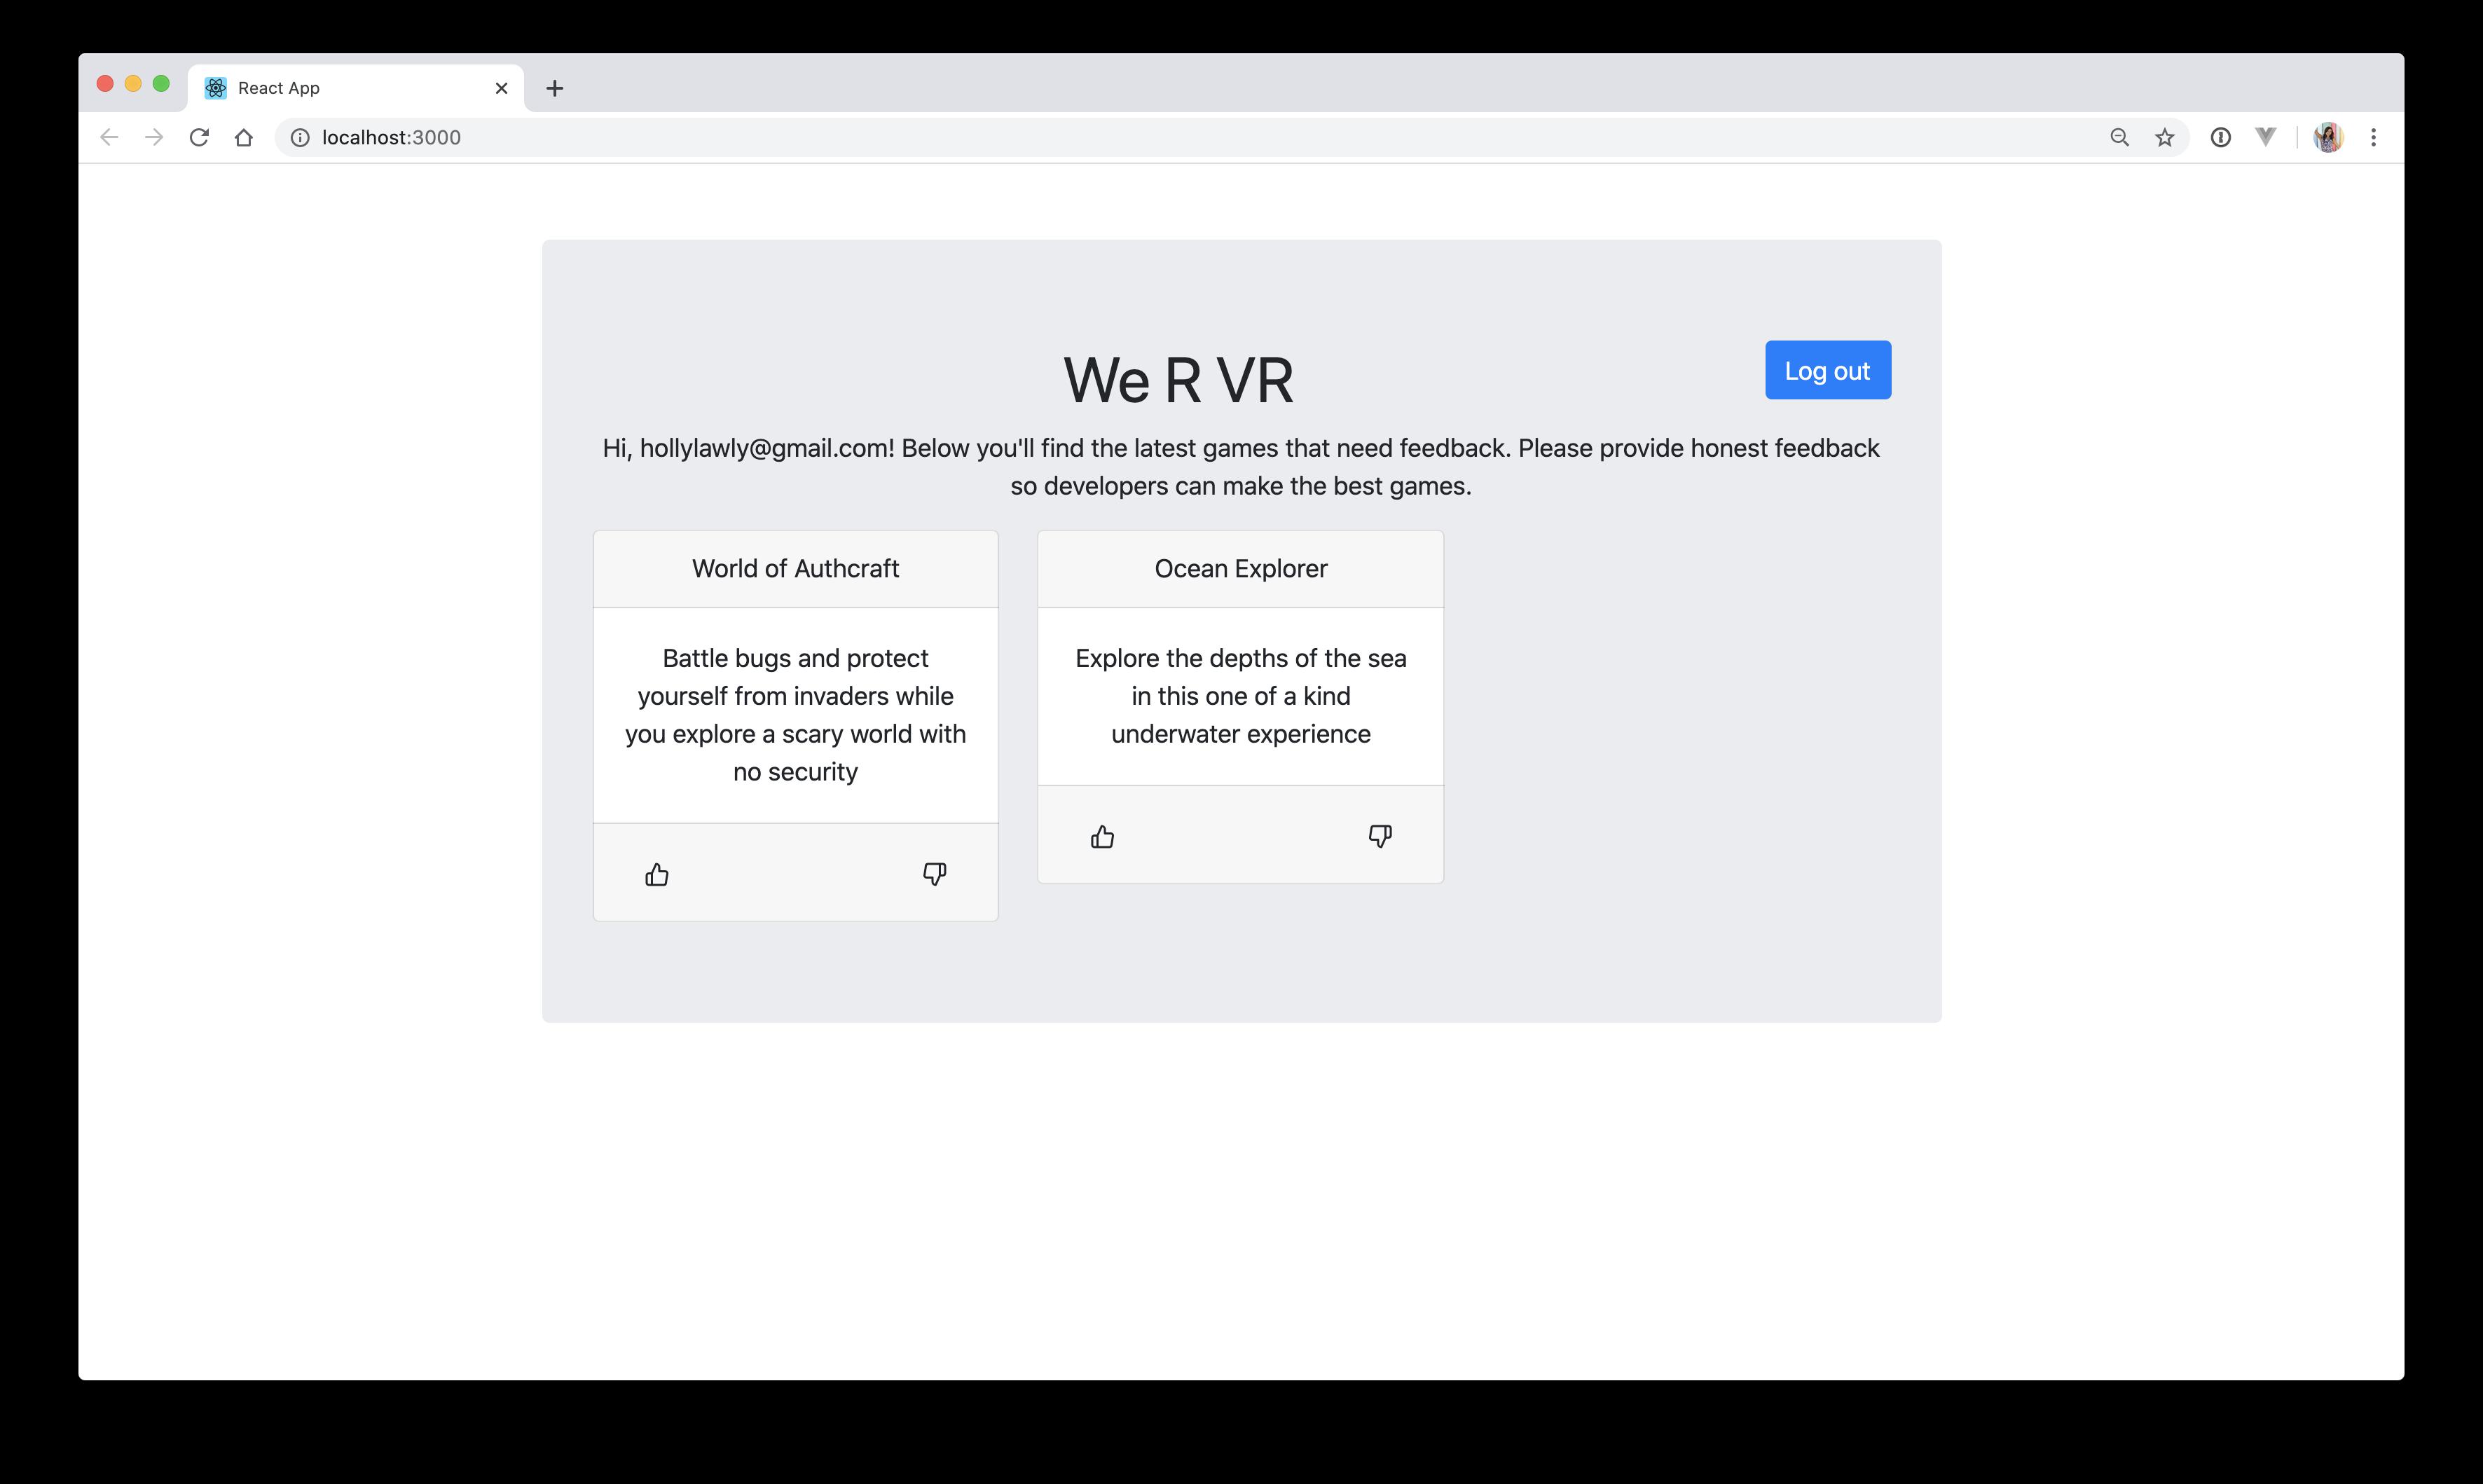 We R VR React Login Page